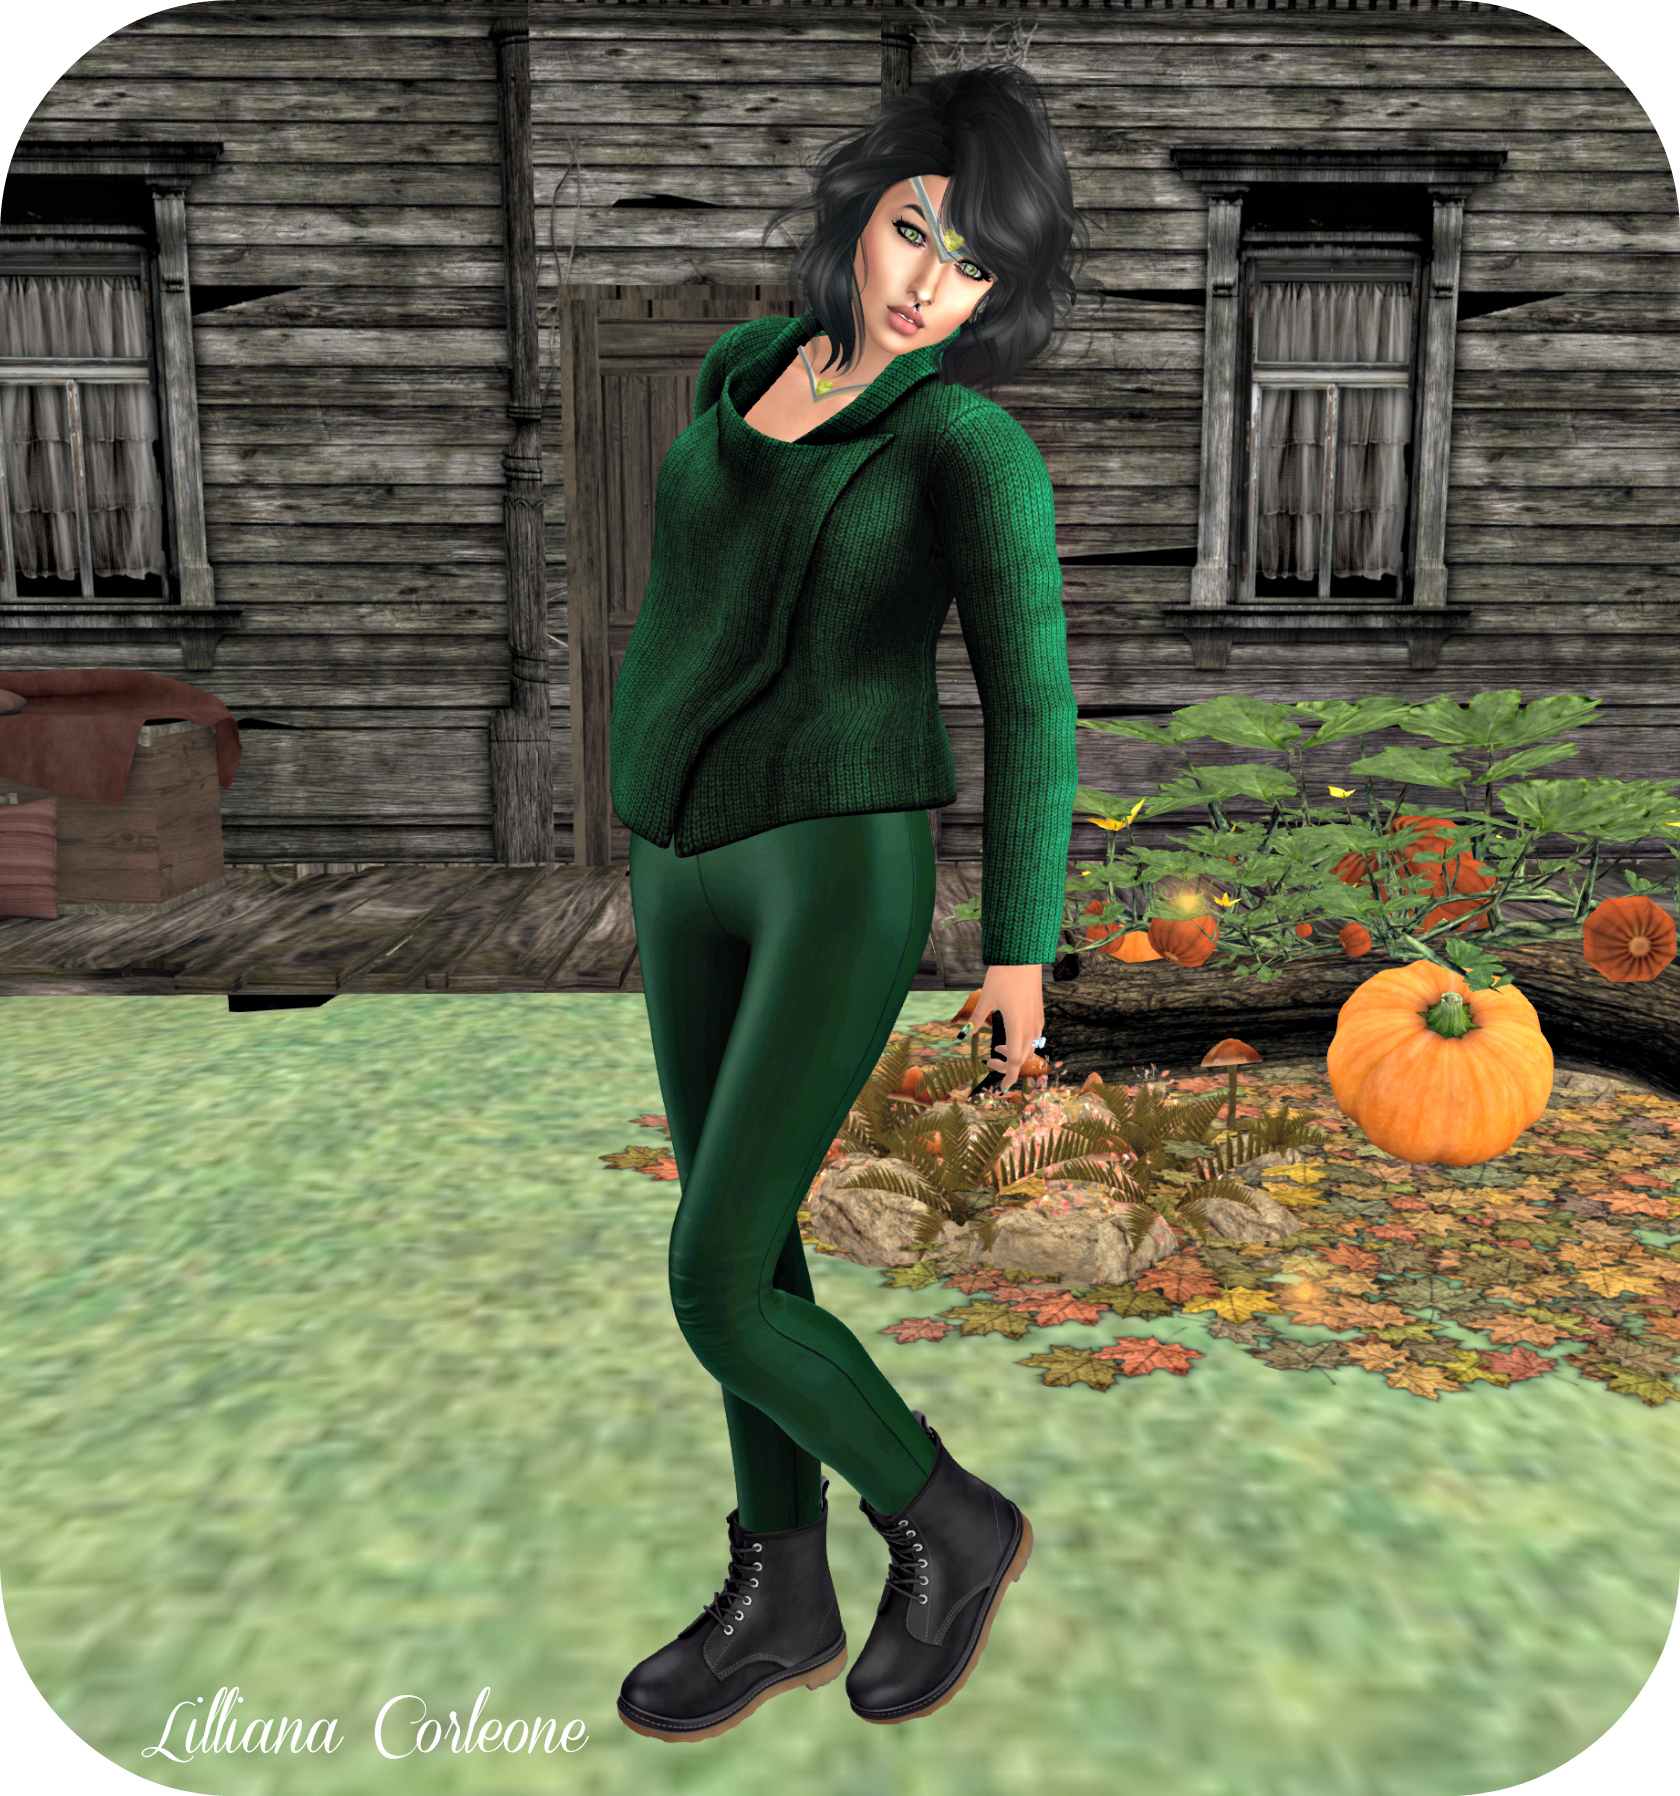 october-blog-post-photo-1_001